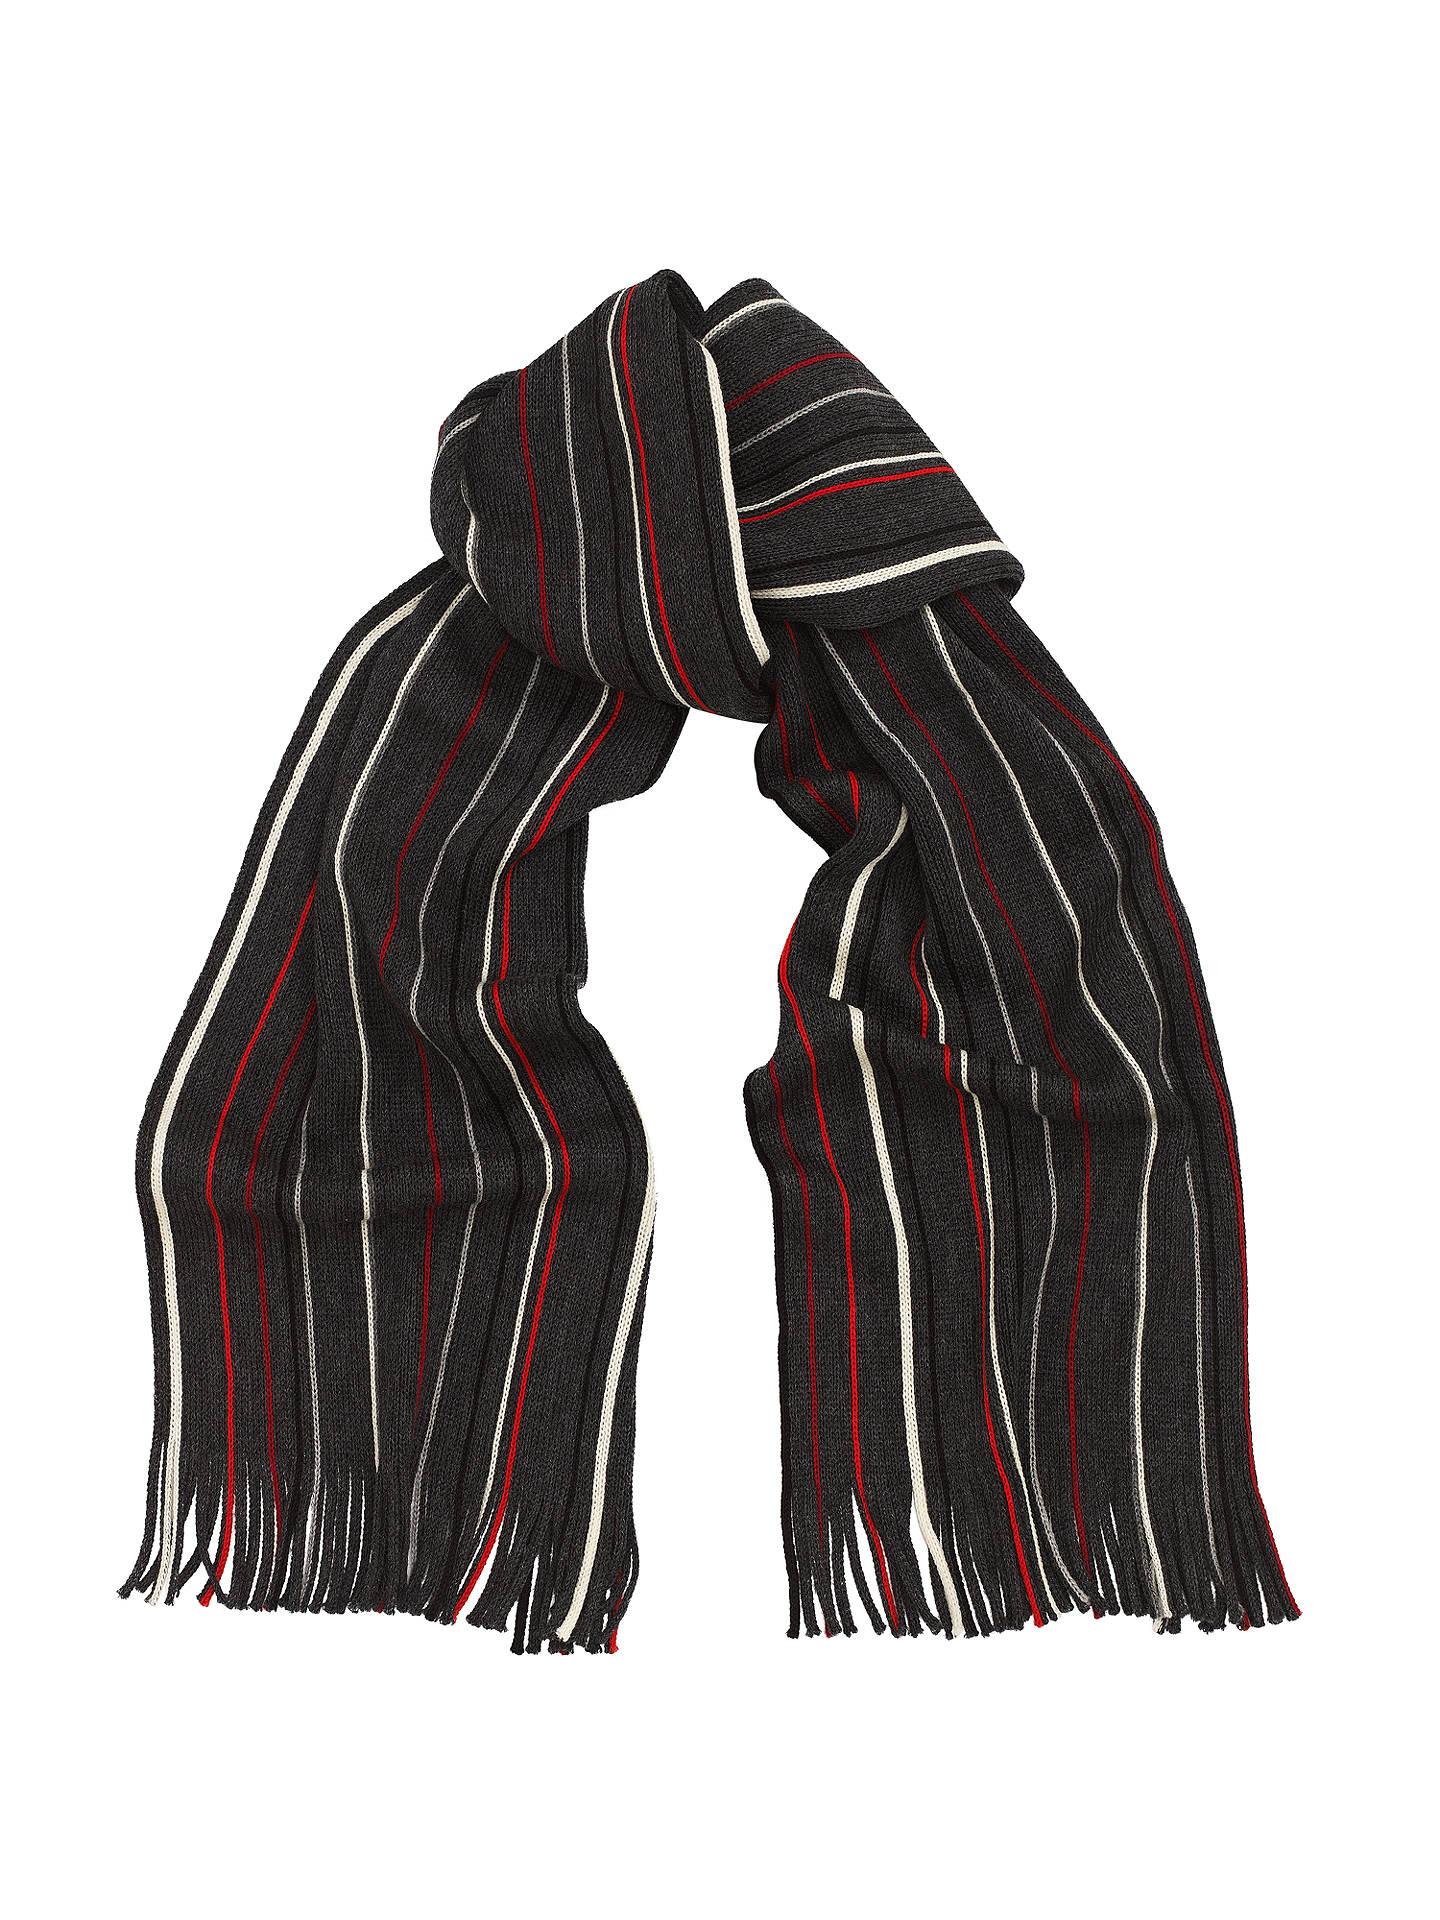 winter warm cashmere scarf wool soft tassle end wrap neck maxi cozy women ladies